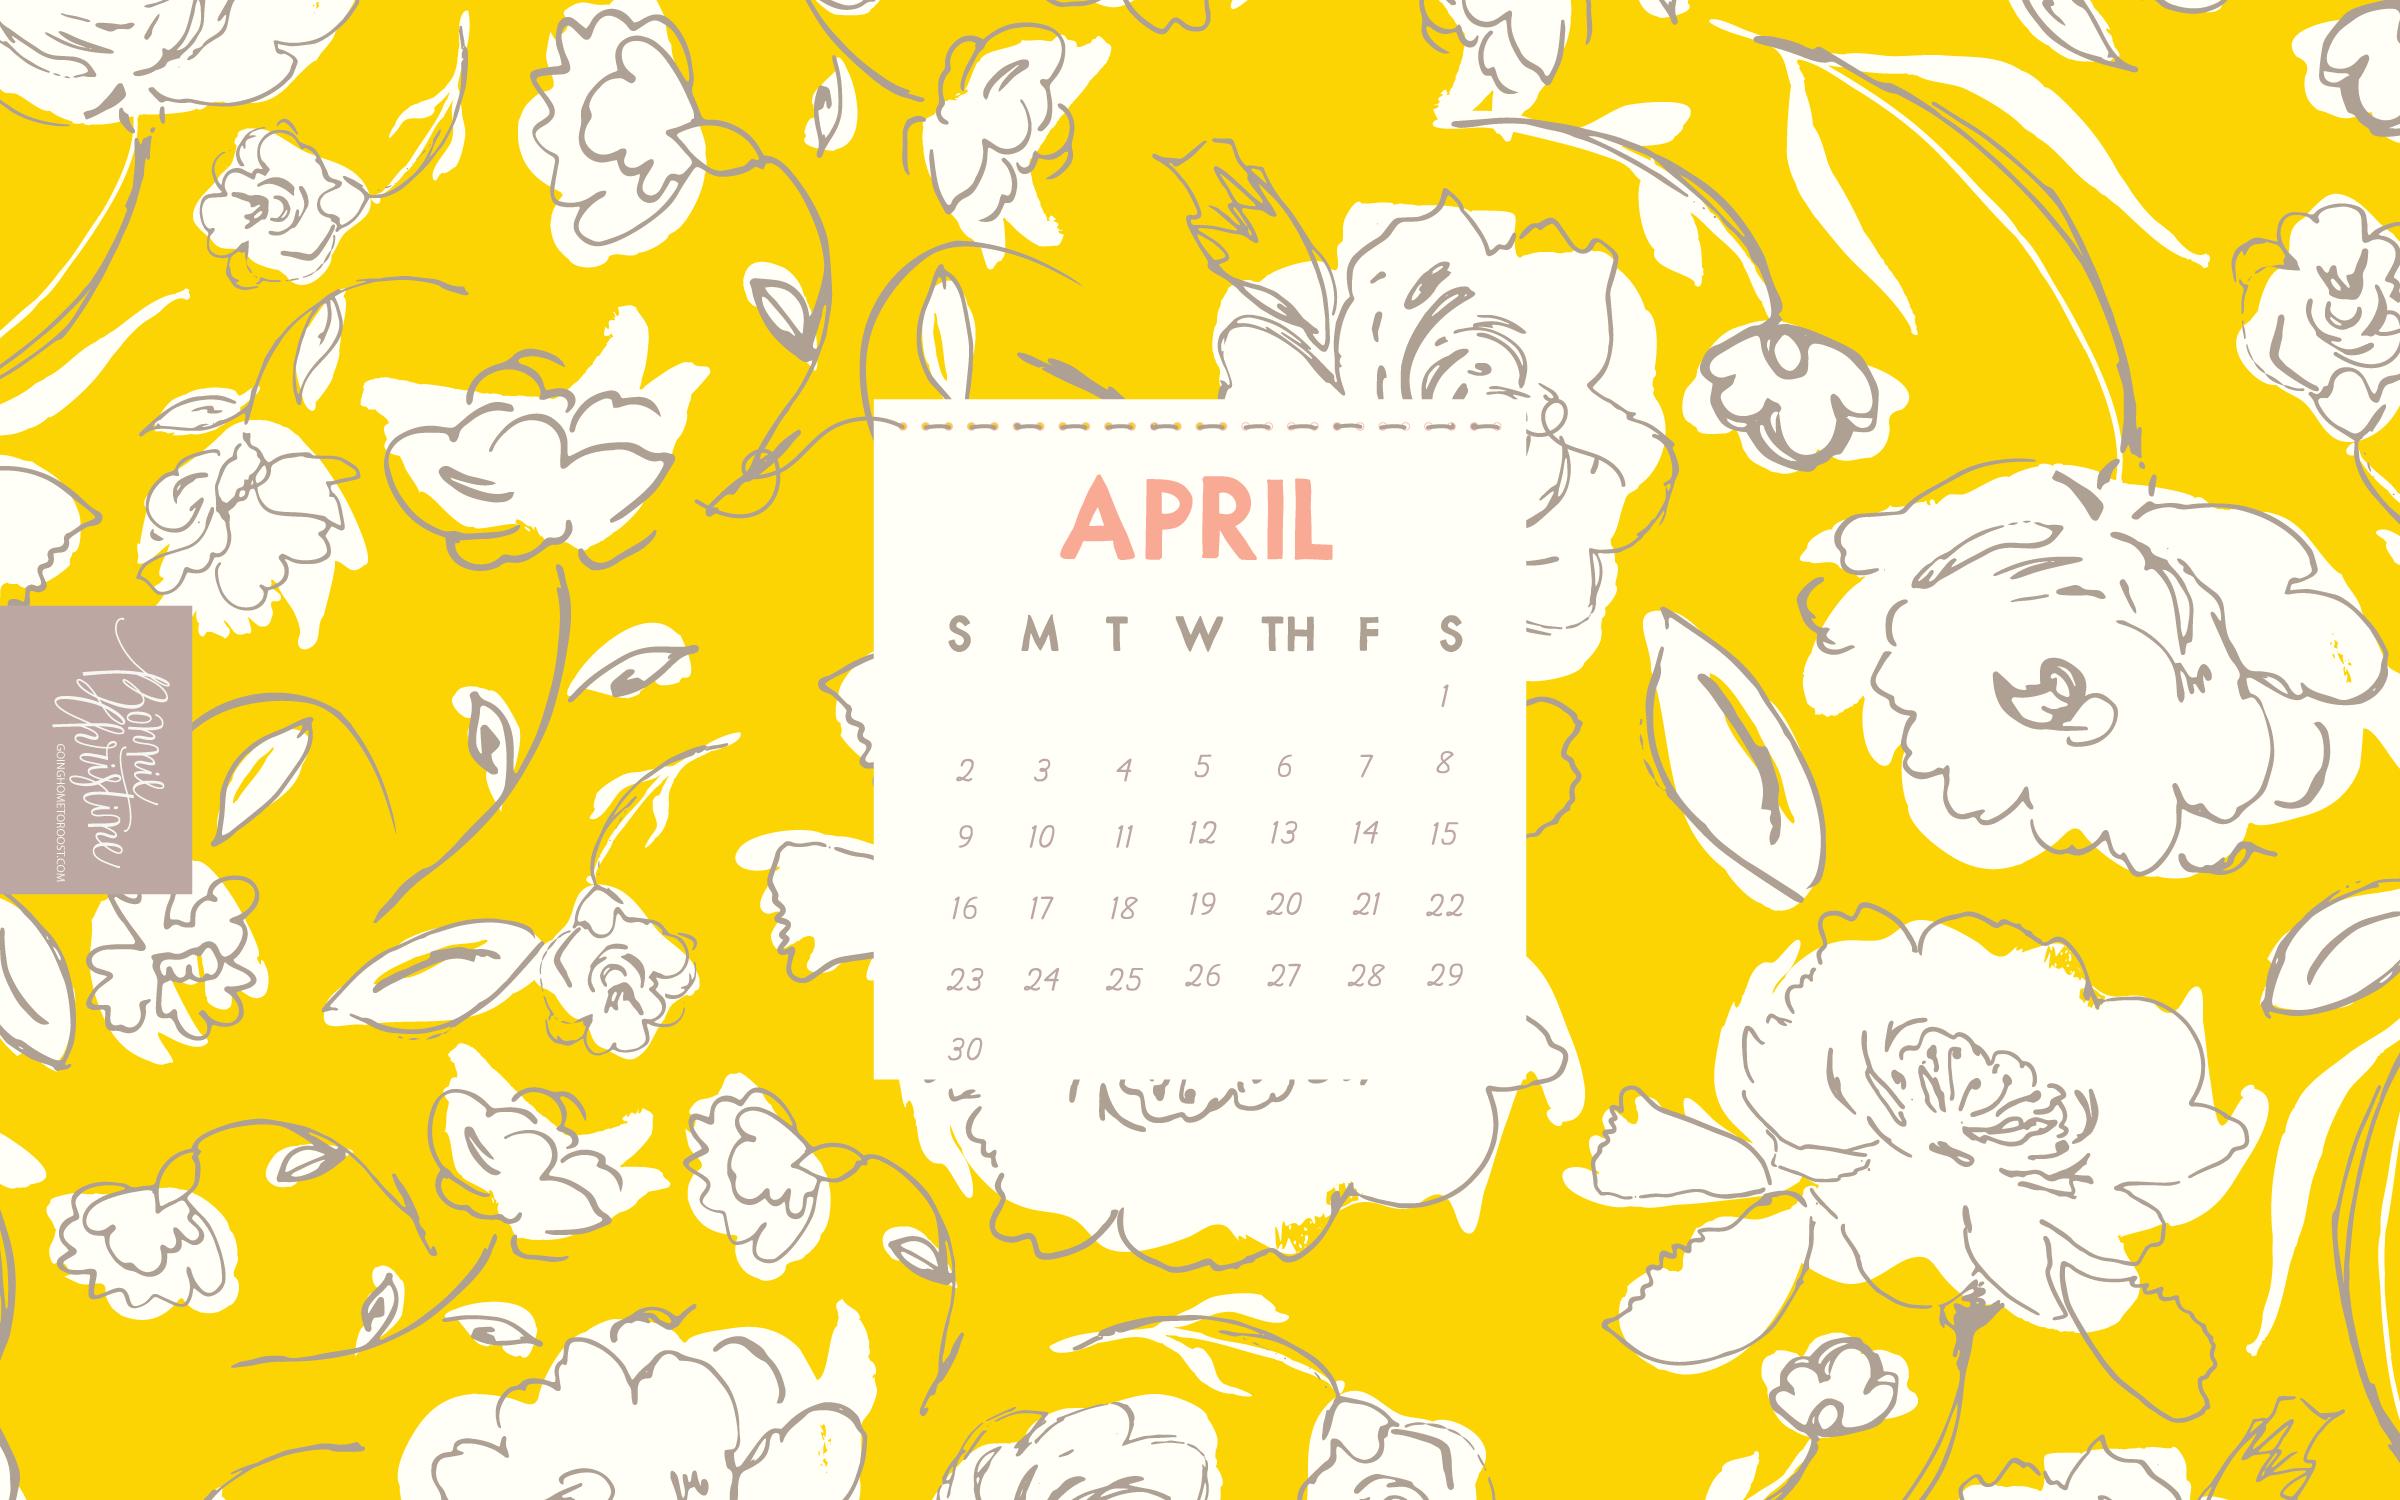 Floral April 2019 Desktop Calendar Wallpaper Calendar Wallpaper Desktop Wallpaper Calendar Desktop Calendar